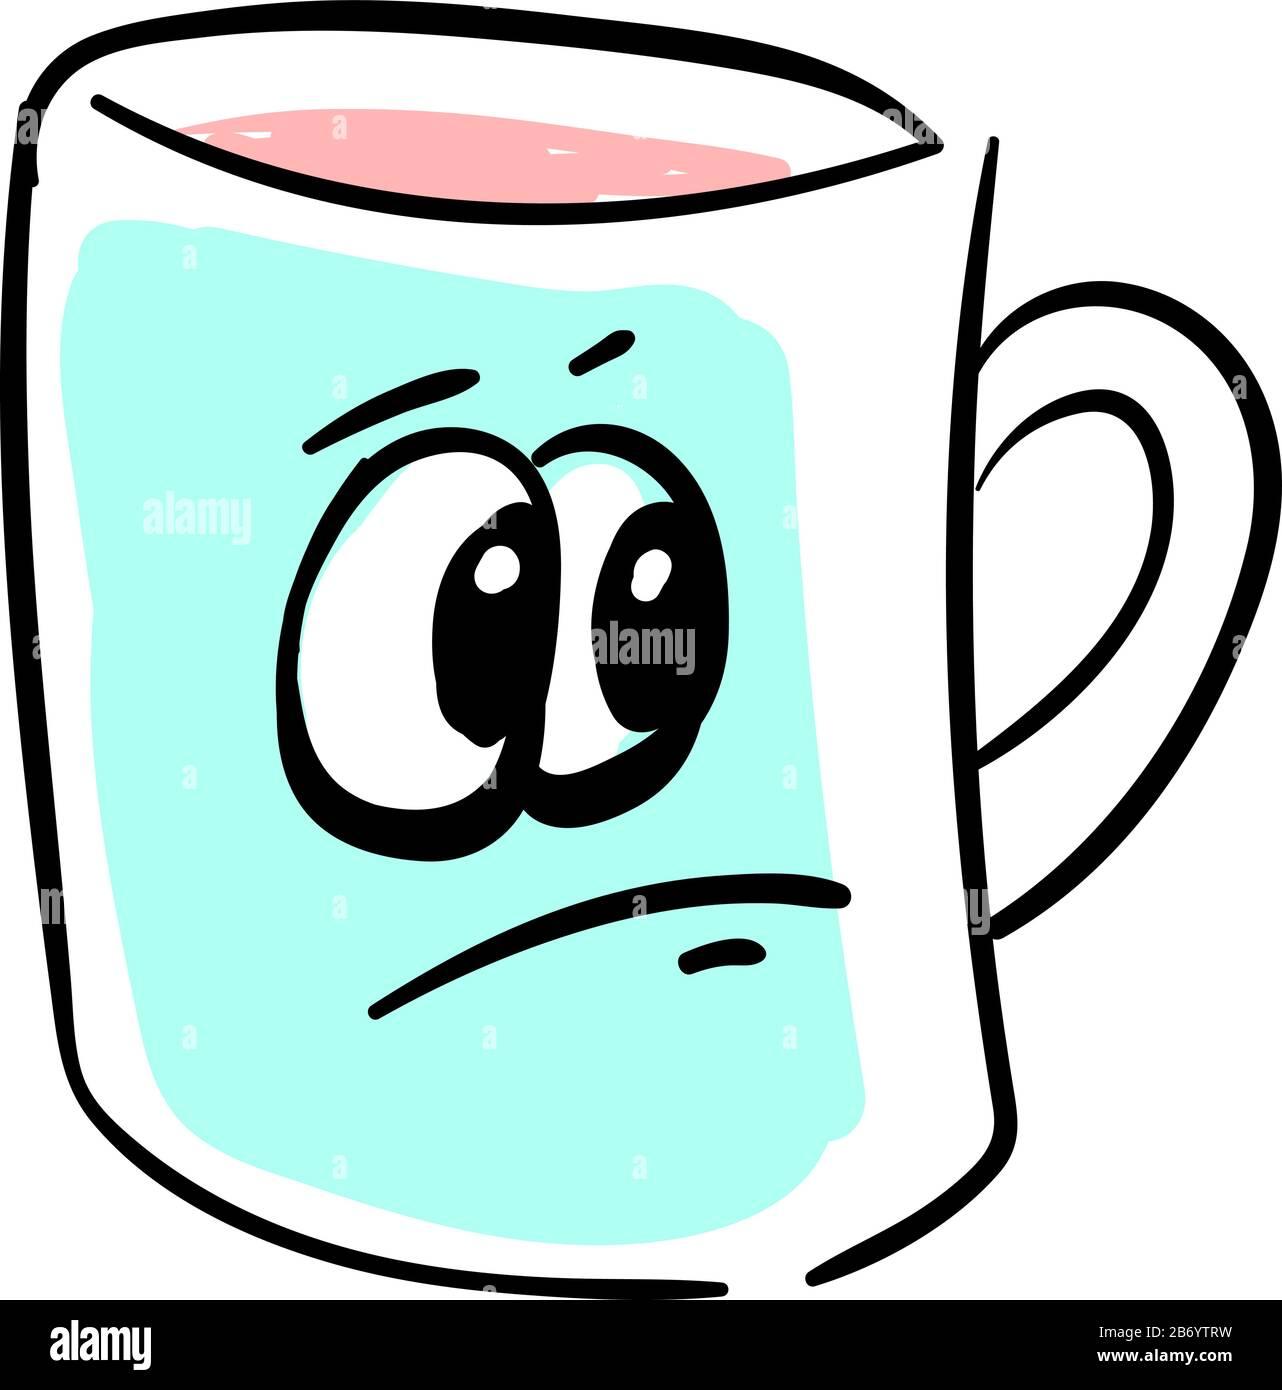 Sad Coffee Mug Illustration Vector On White Background Stock Vector Image Art Alamy